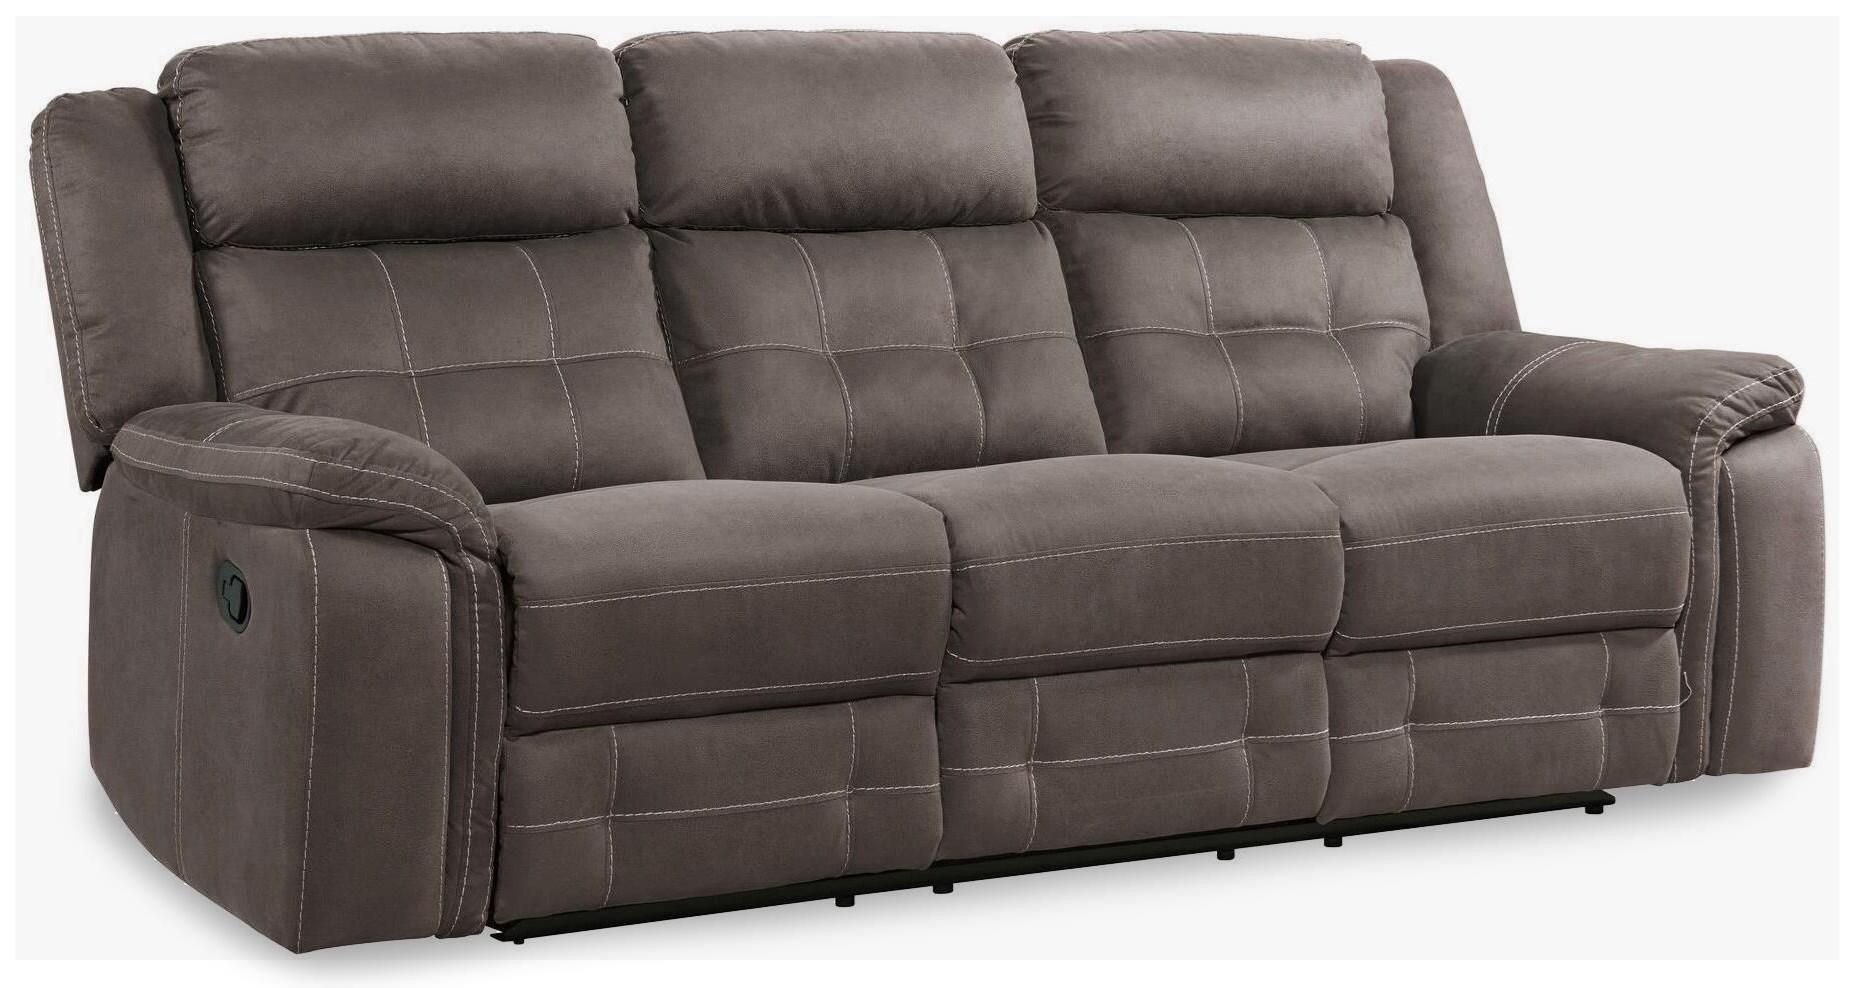 Keystone Dual Reclining Sofa at Rotmans